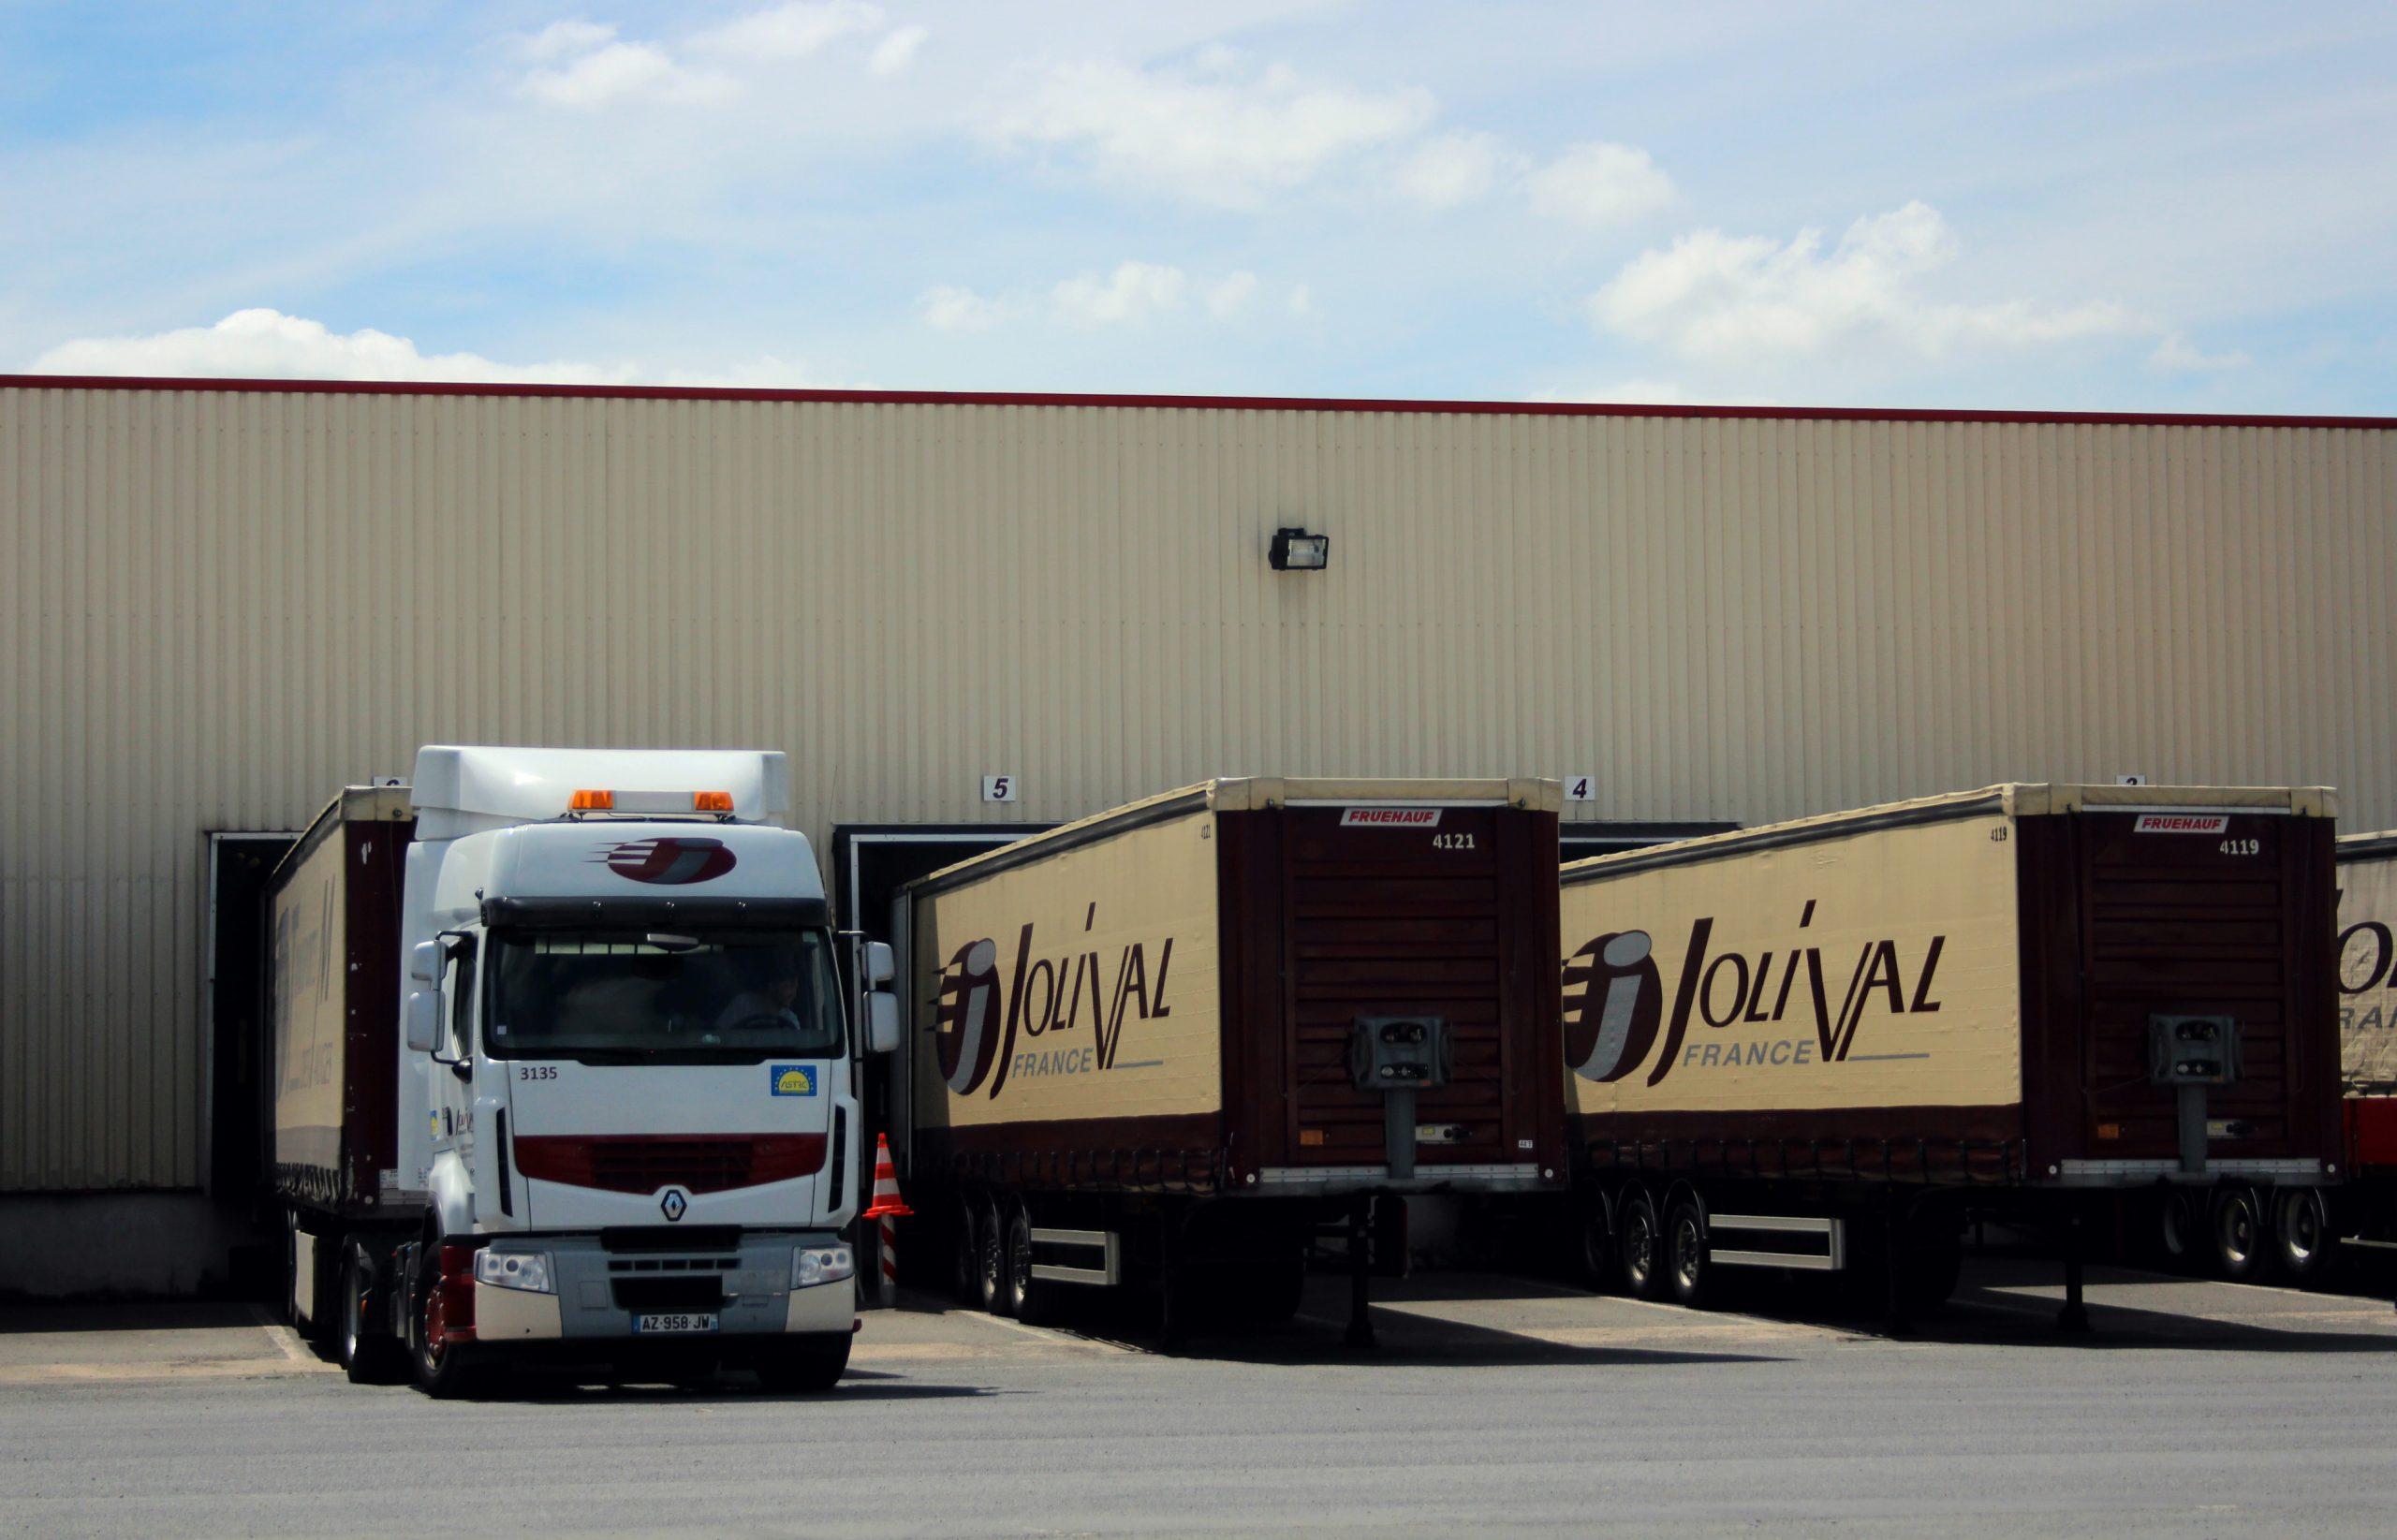 chargement-camion-transport-jolival